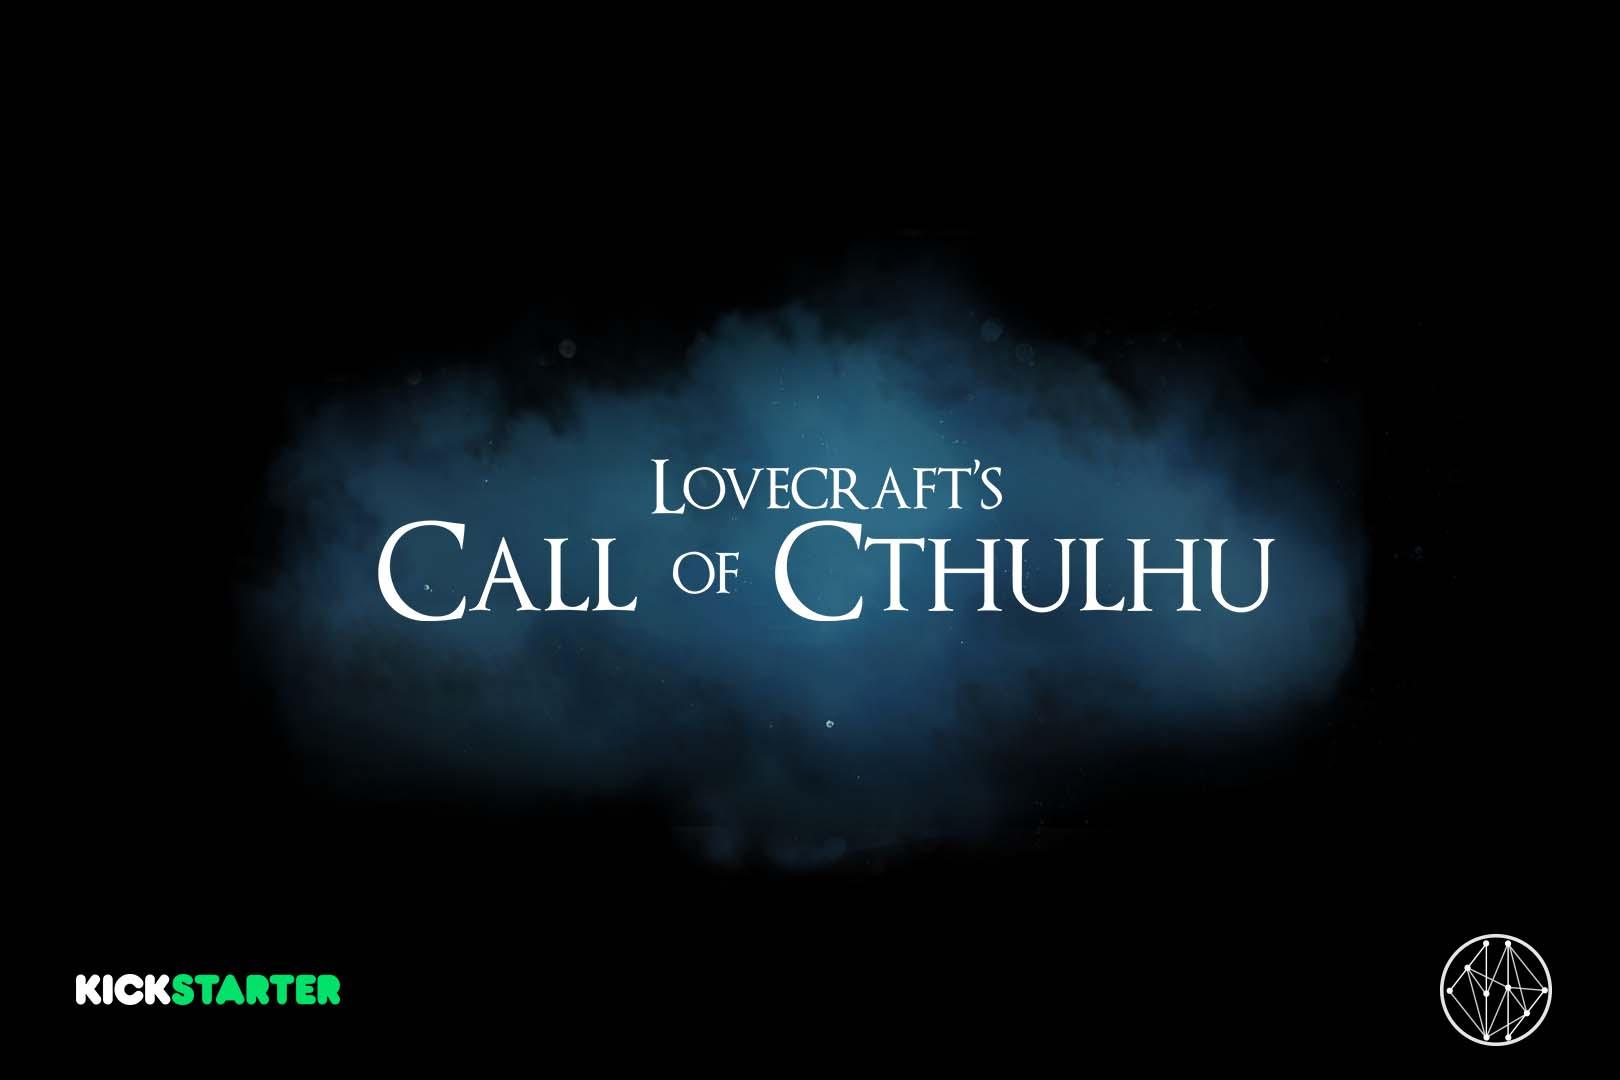 portfolio-lovecrafts-call-of-cthulhu-at-elevendots-1